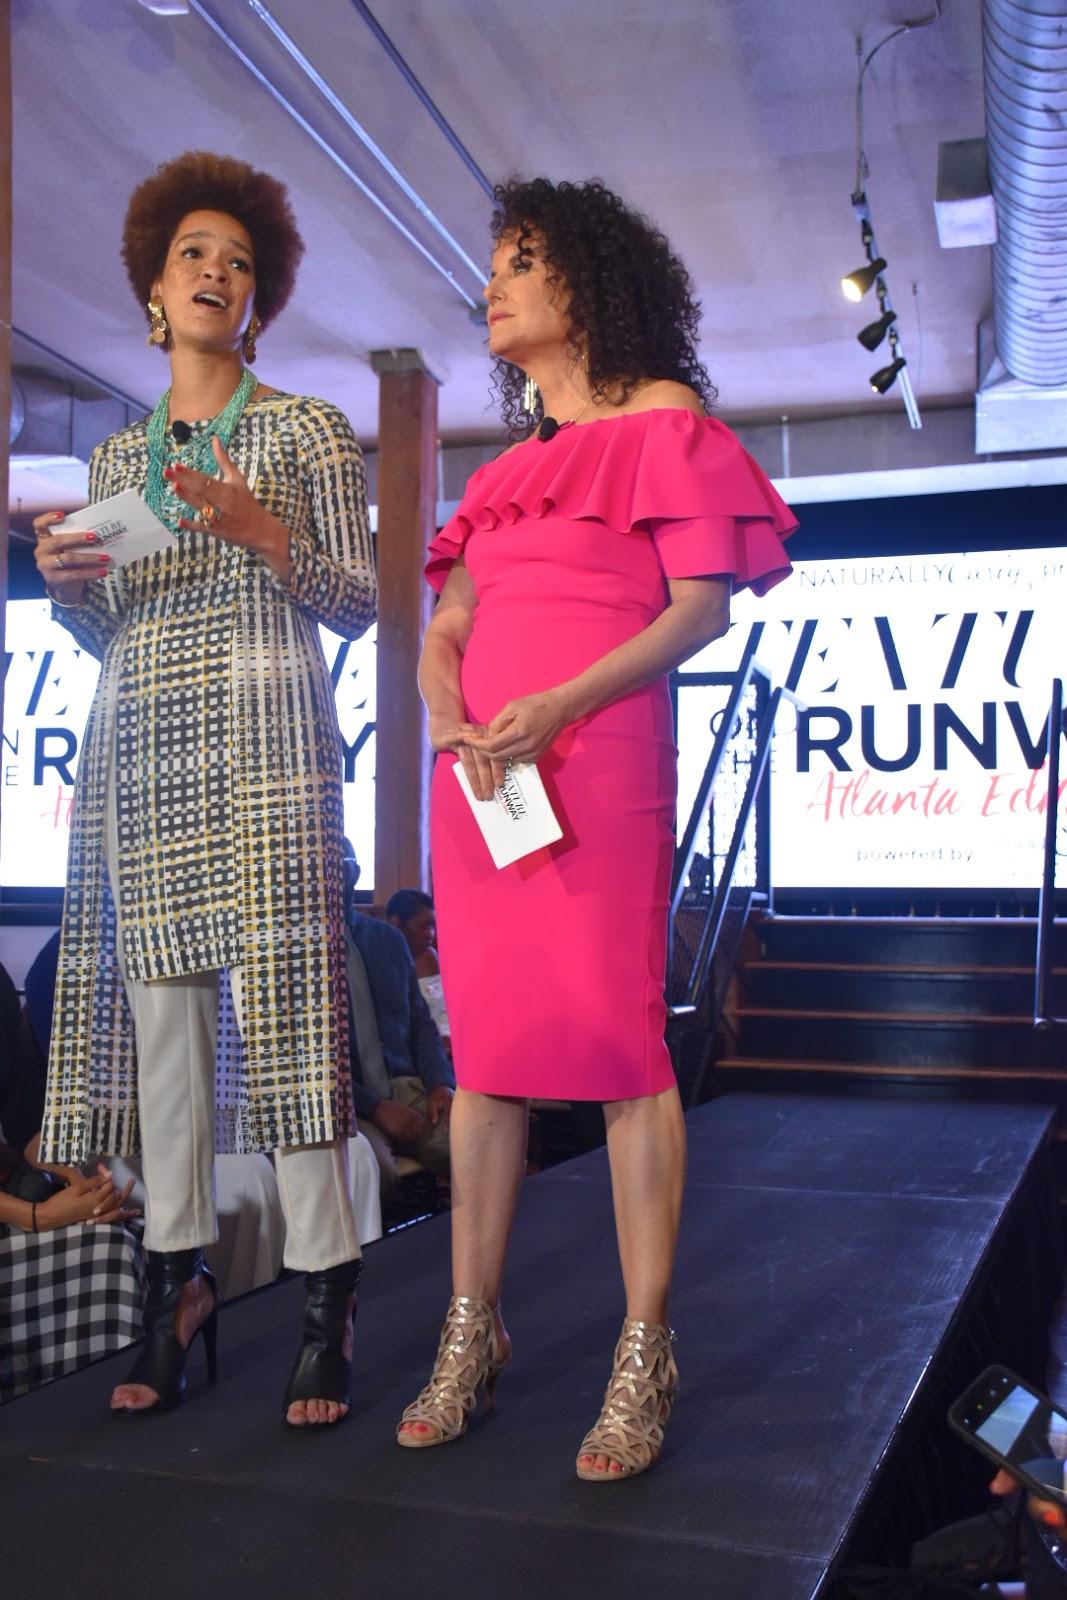 NaturallyCurly's Texture on the Runway Atlanta Edition Recap  via  www.productreviewmom.com